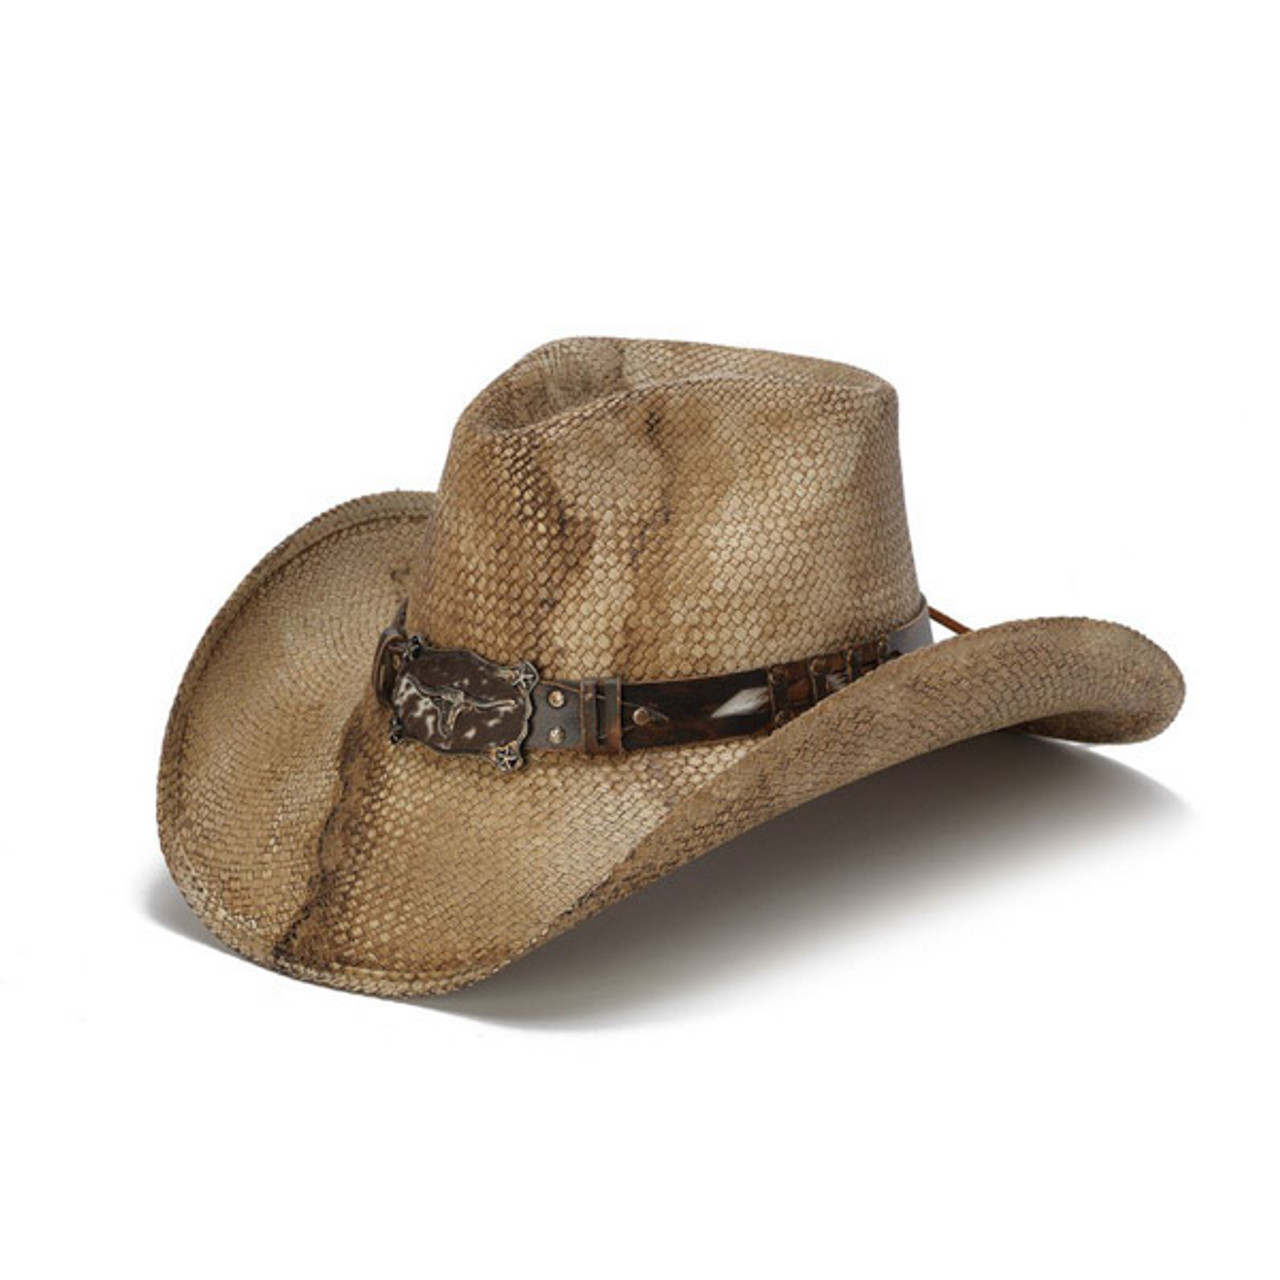 c22d492f2 Stampede Hats - Rustic Longhorn Cowboy Hat